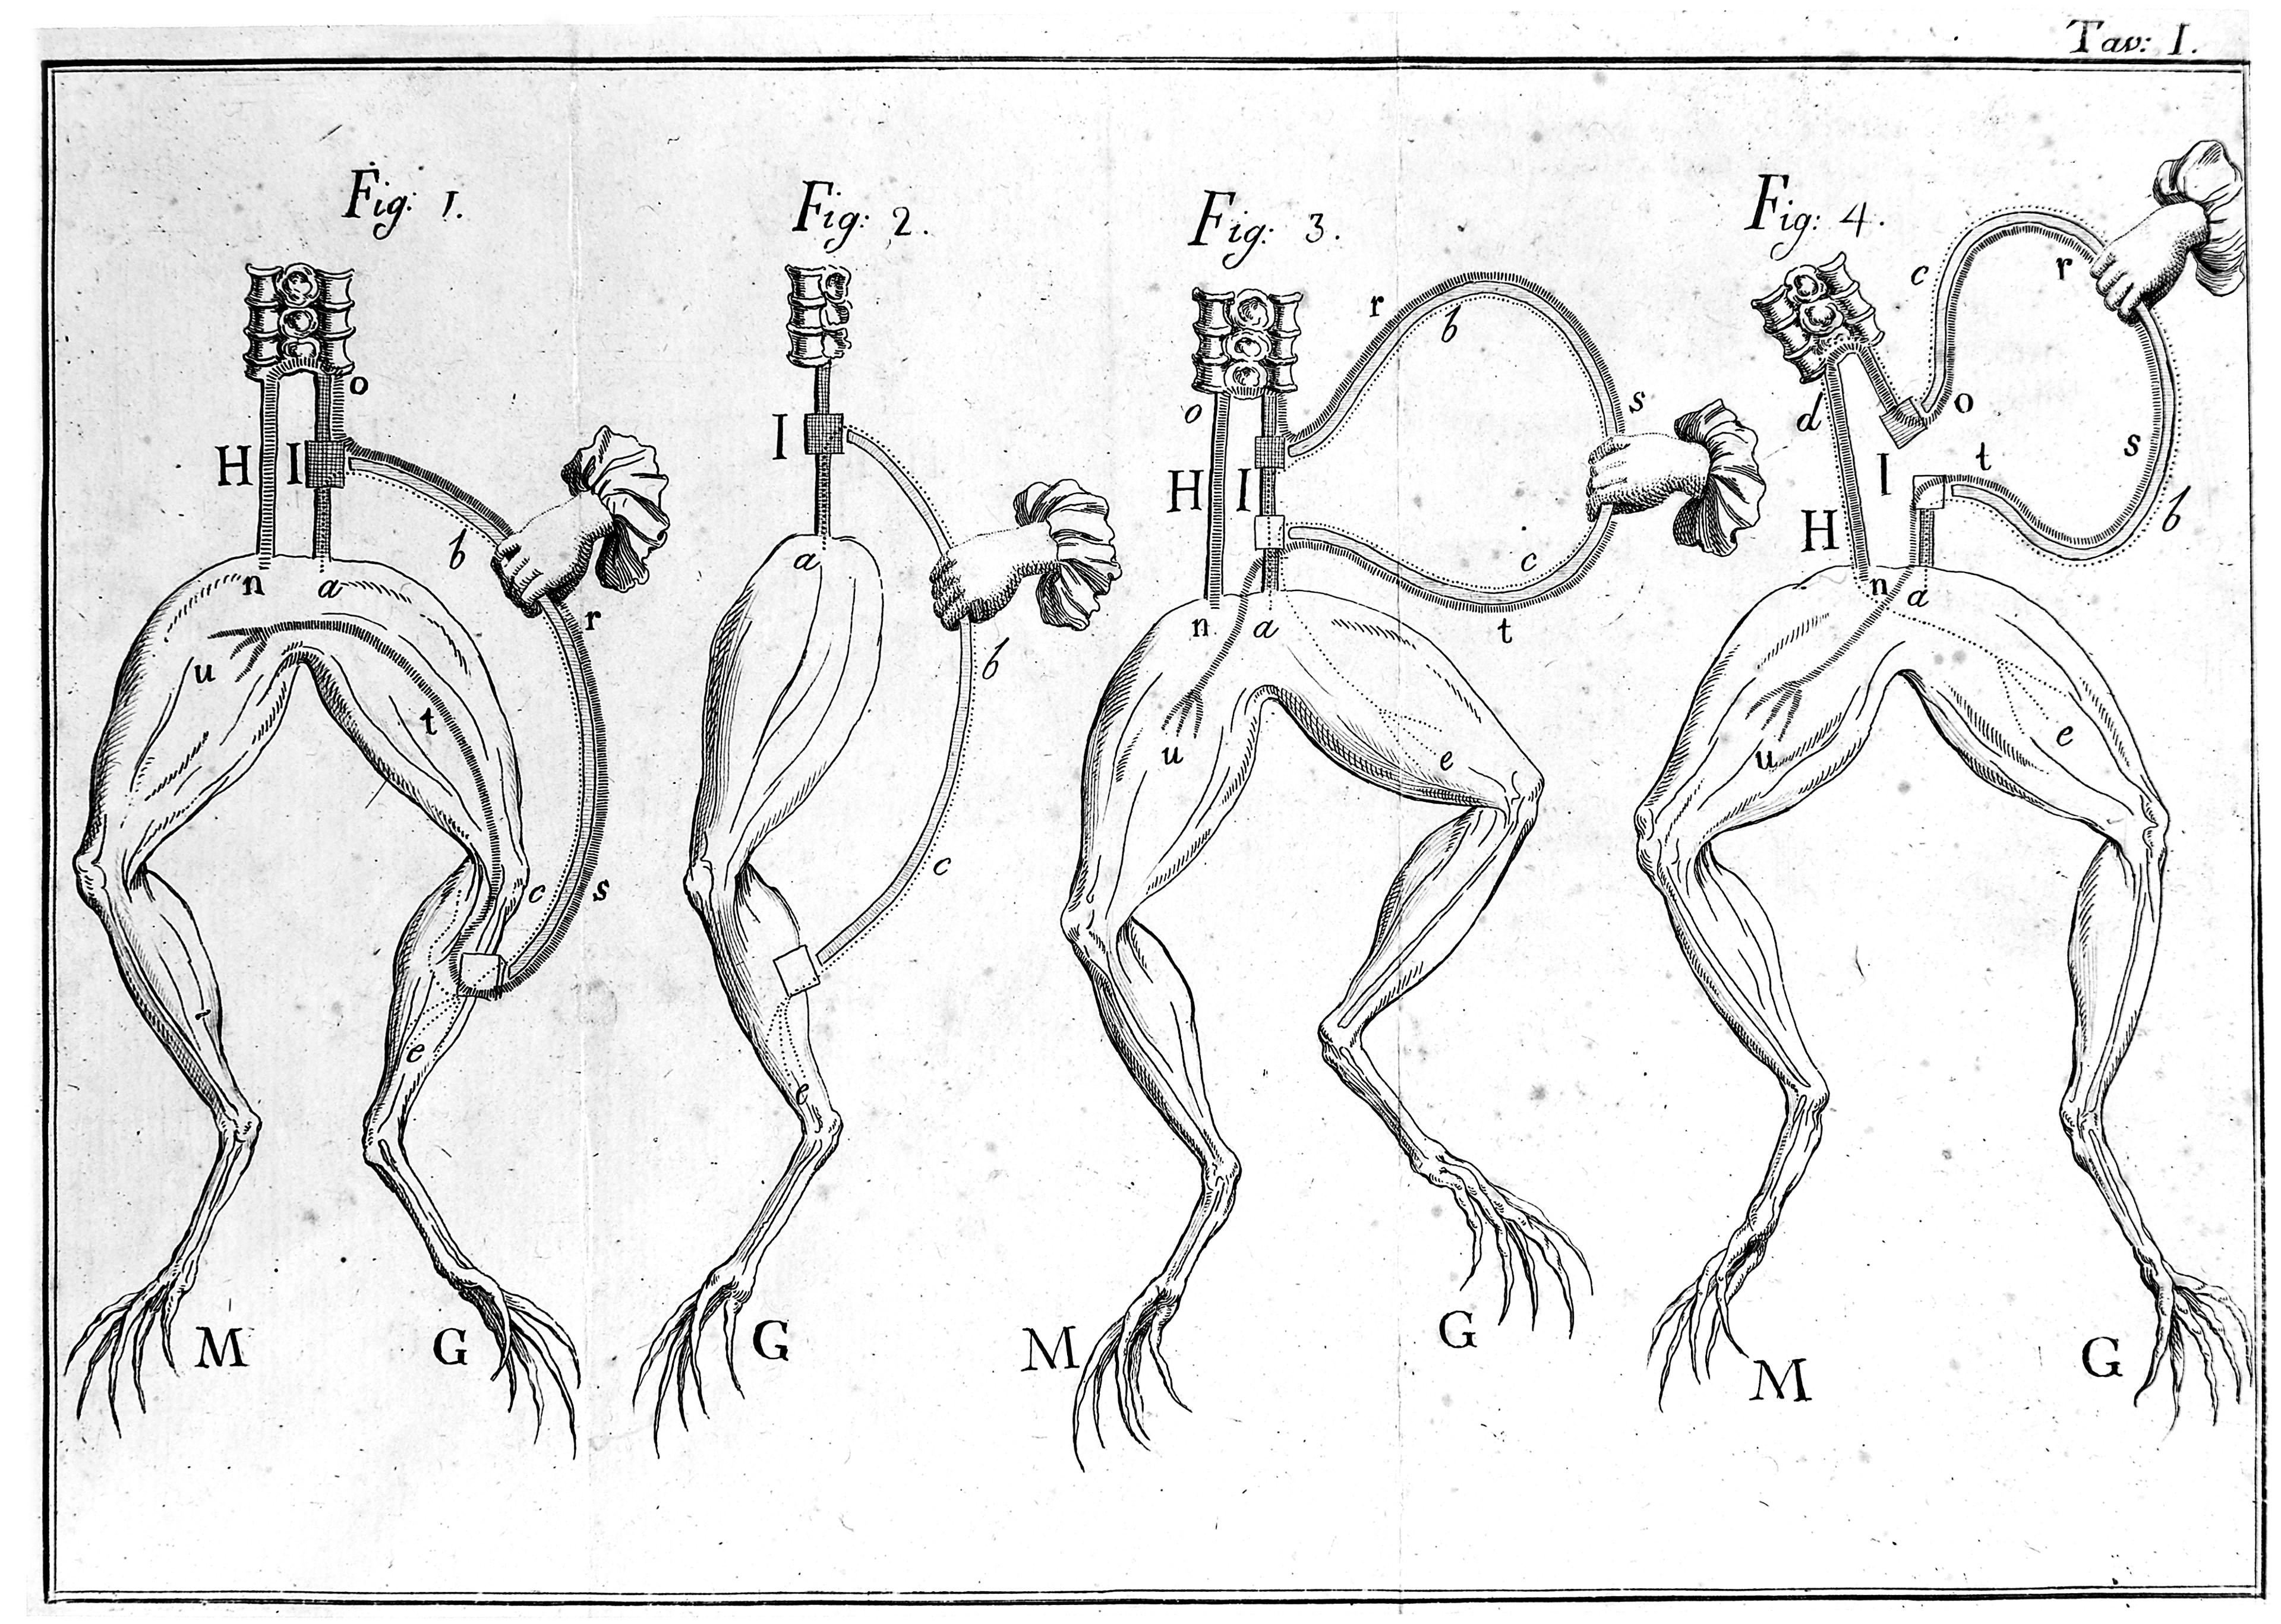 Frog Sciatic Nerve Average Conduction Velocity At Room Temperature